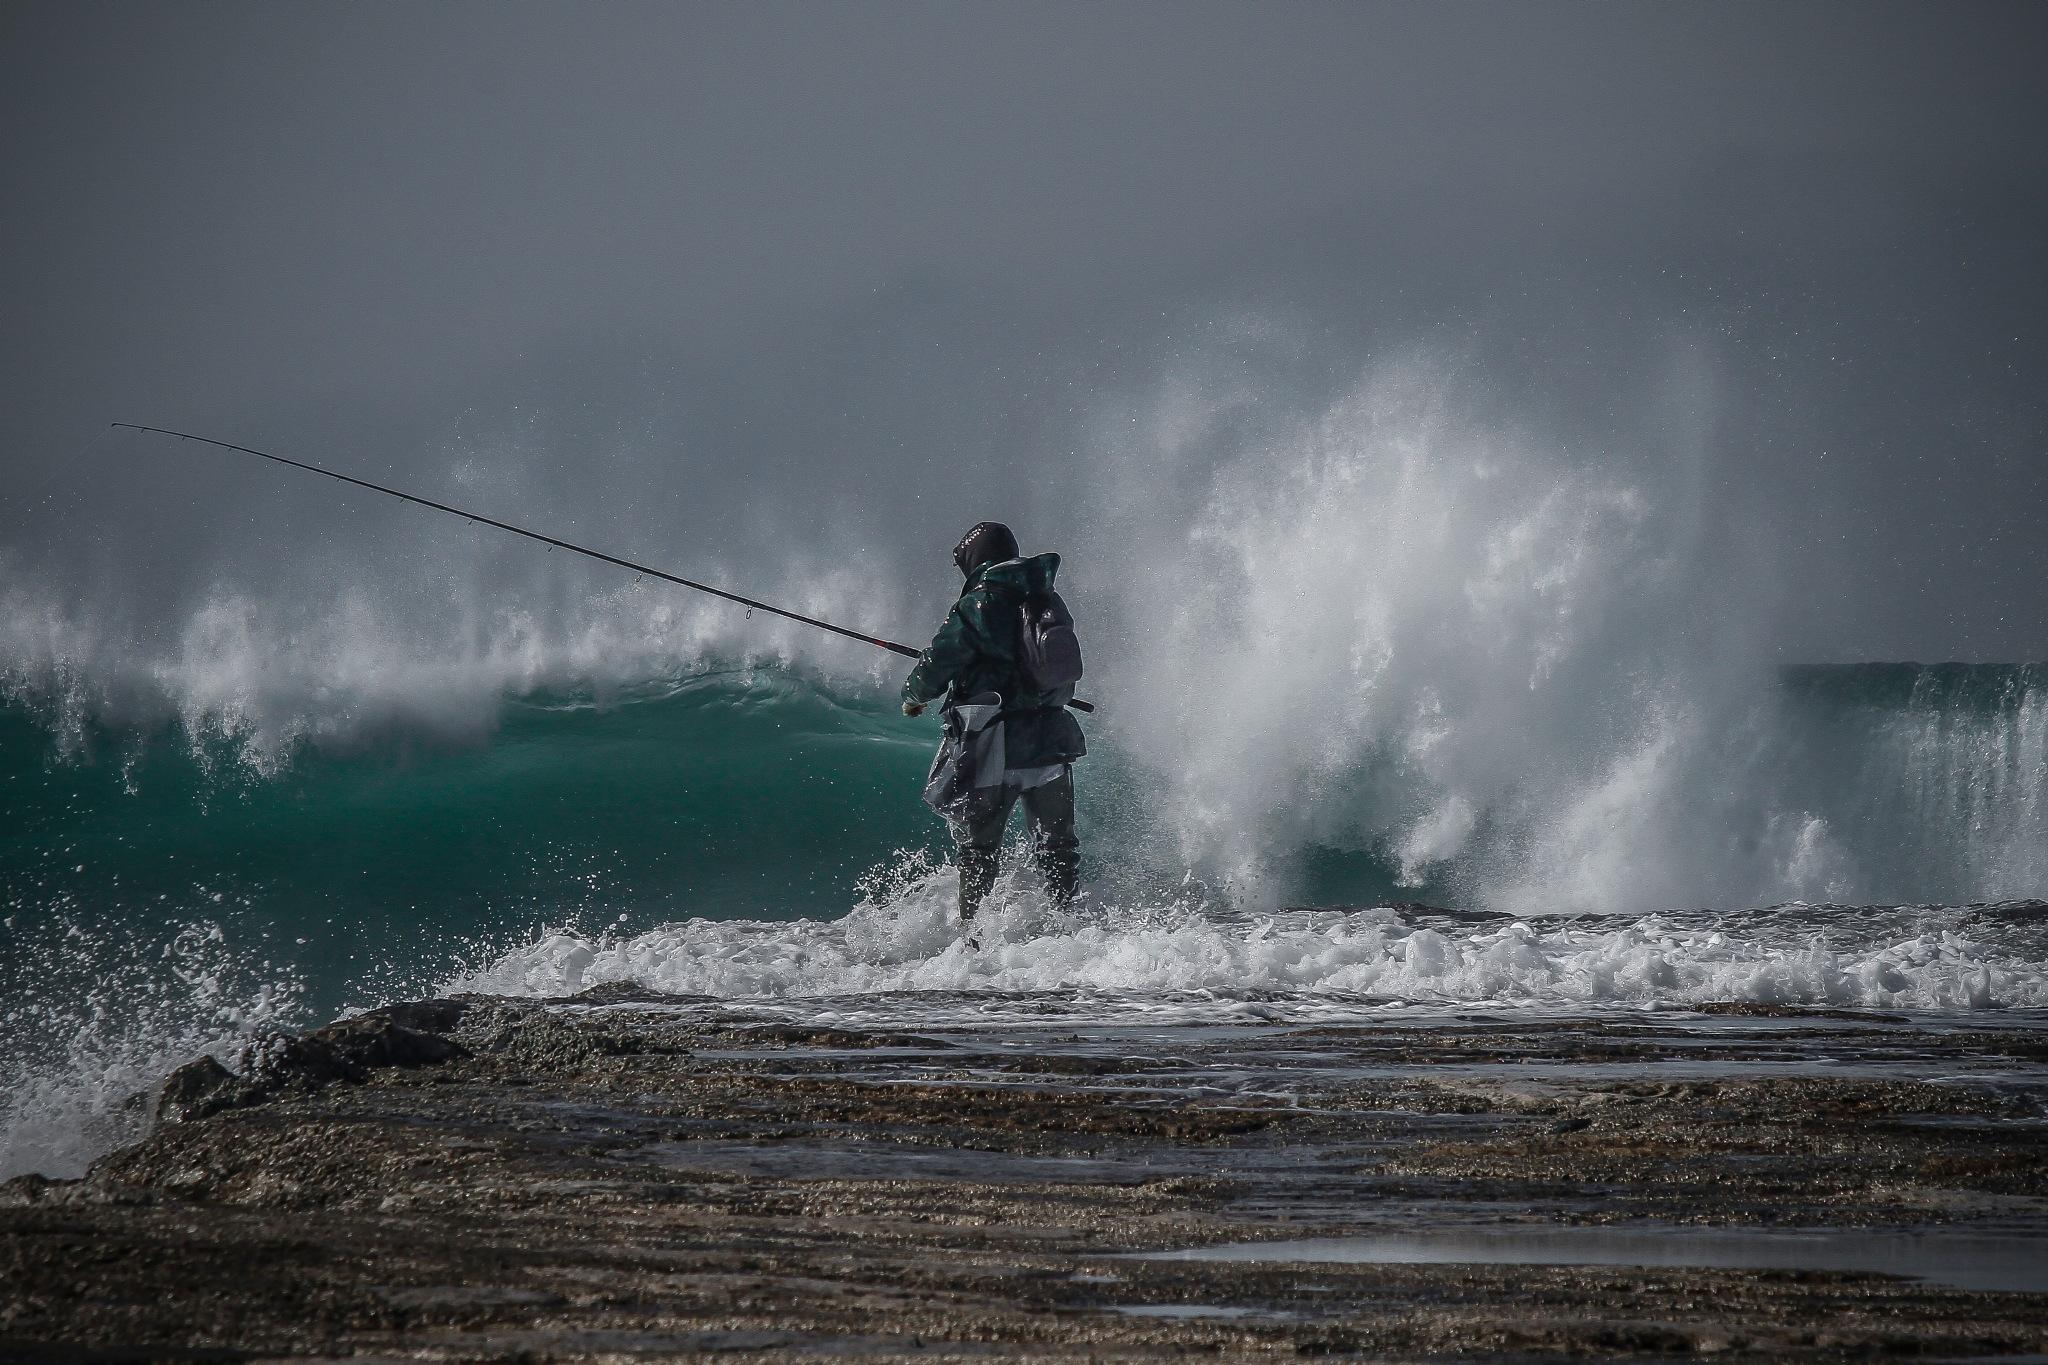 Costa de Caparica by FernandoLopes